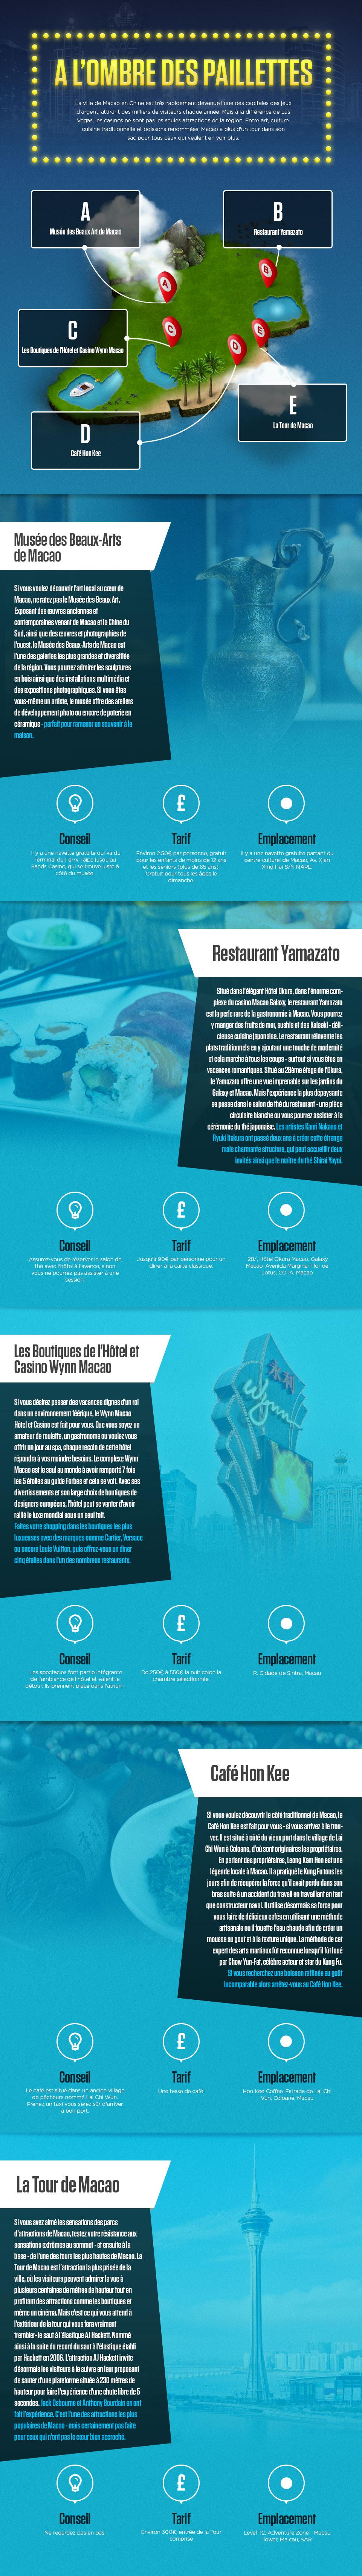 infographie landbrokes activités macao